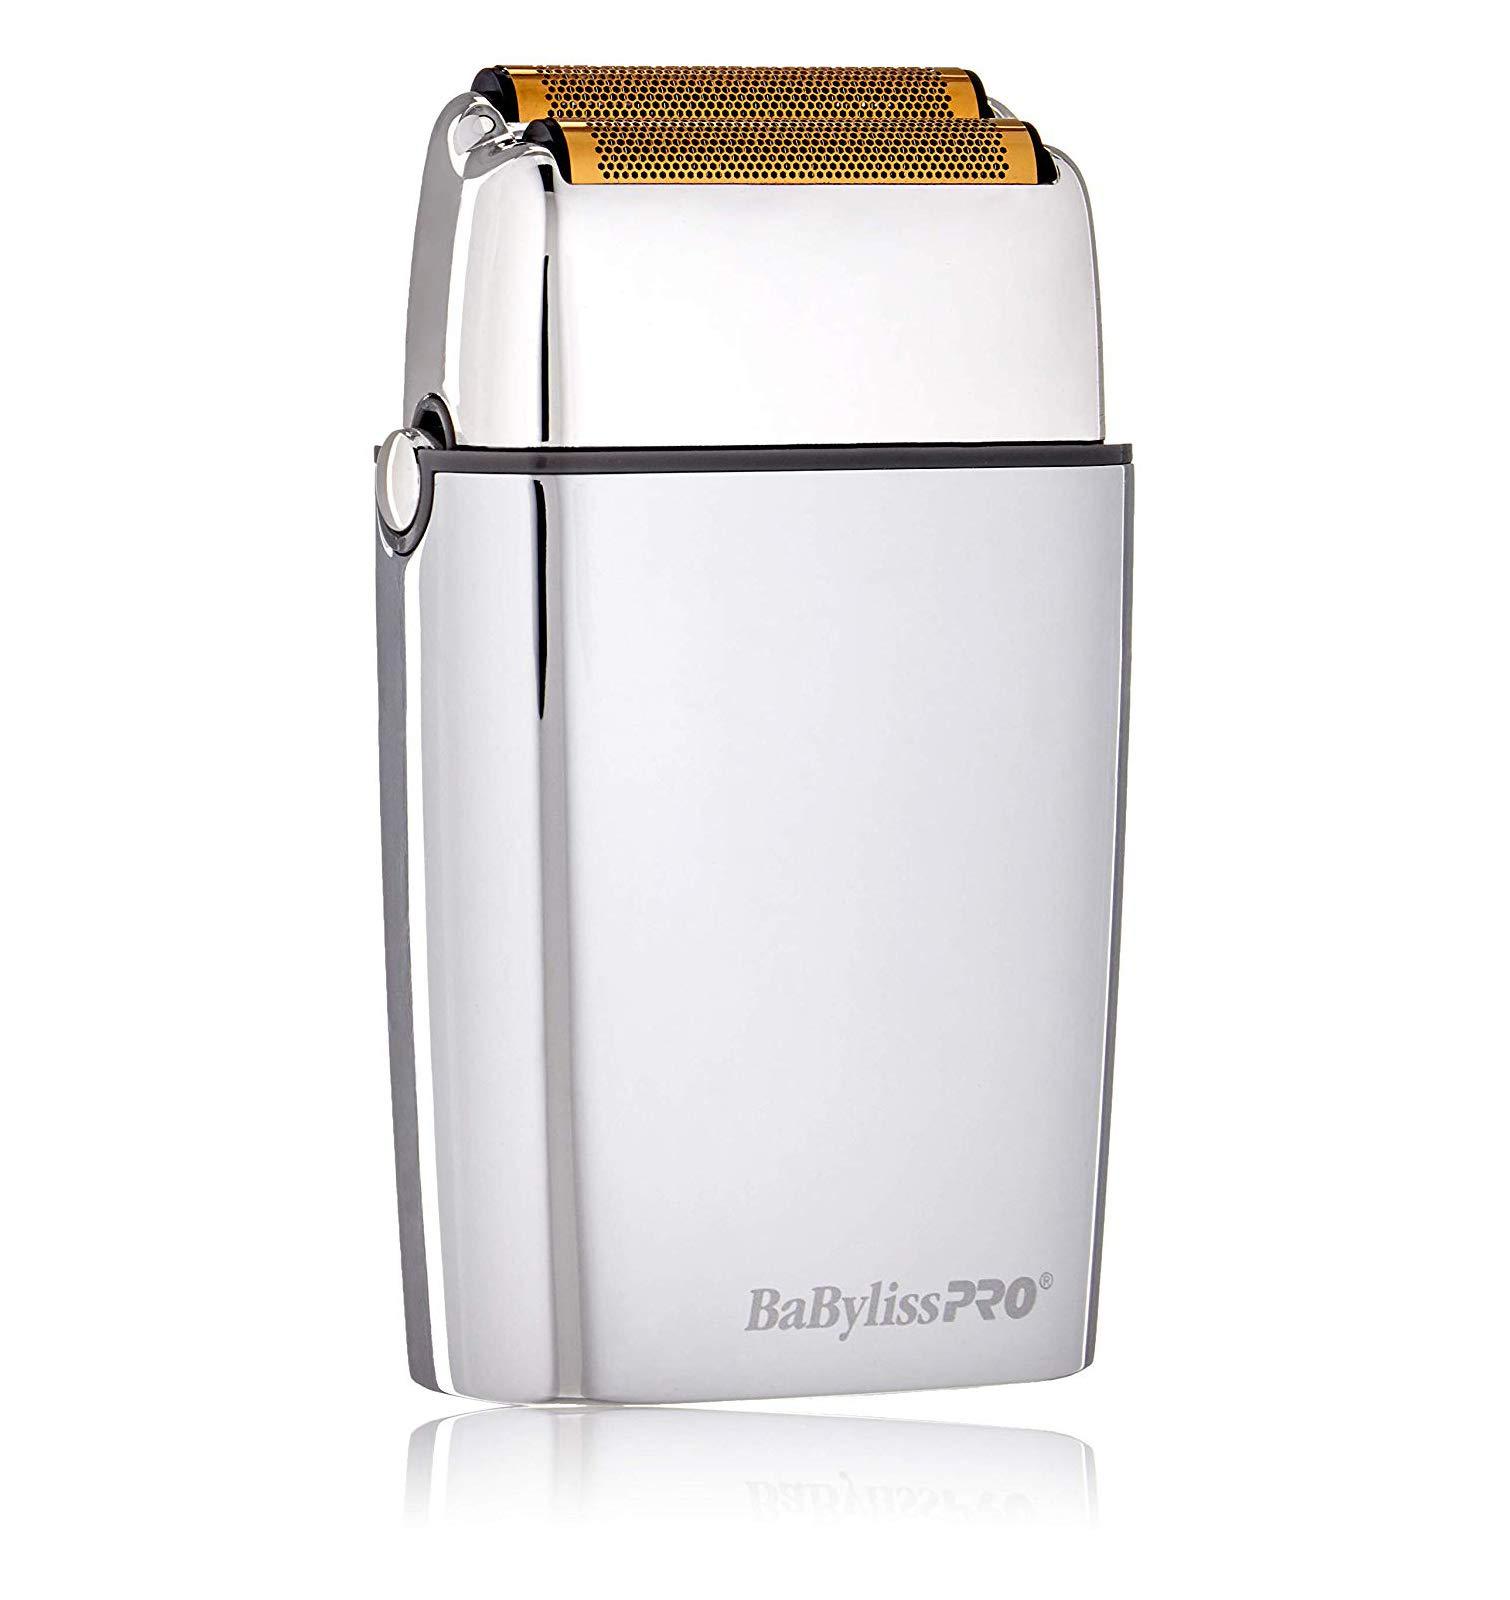 babylisspro barberology cordless metal - 61gTa1E1QmL - BaBylissPRO Barberology Cordless Metal Double Foil Shaver